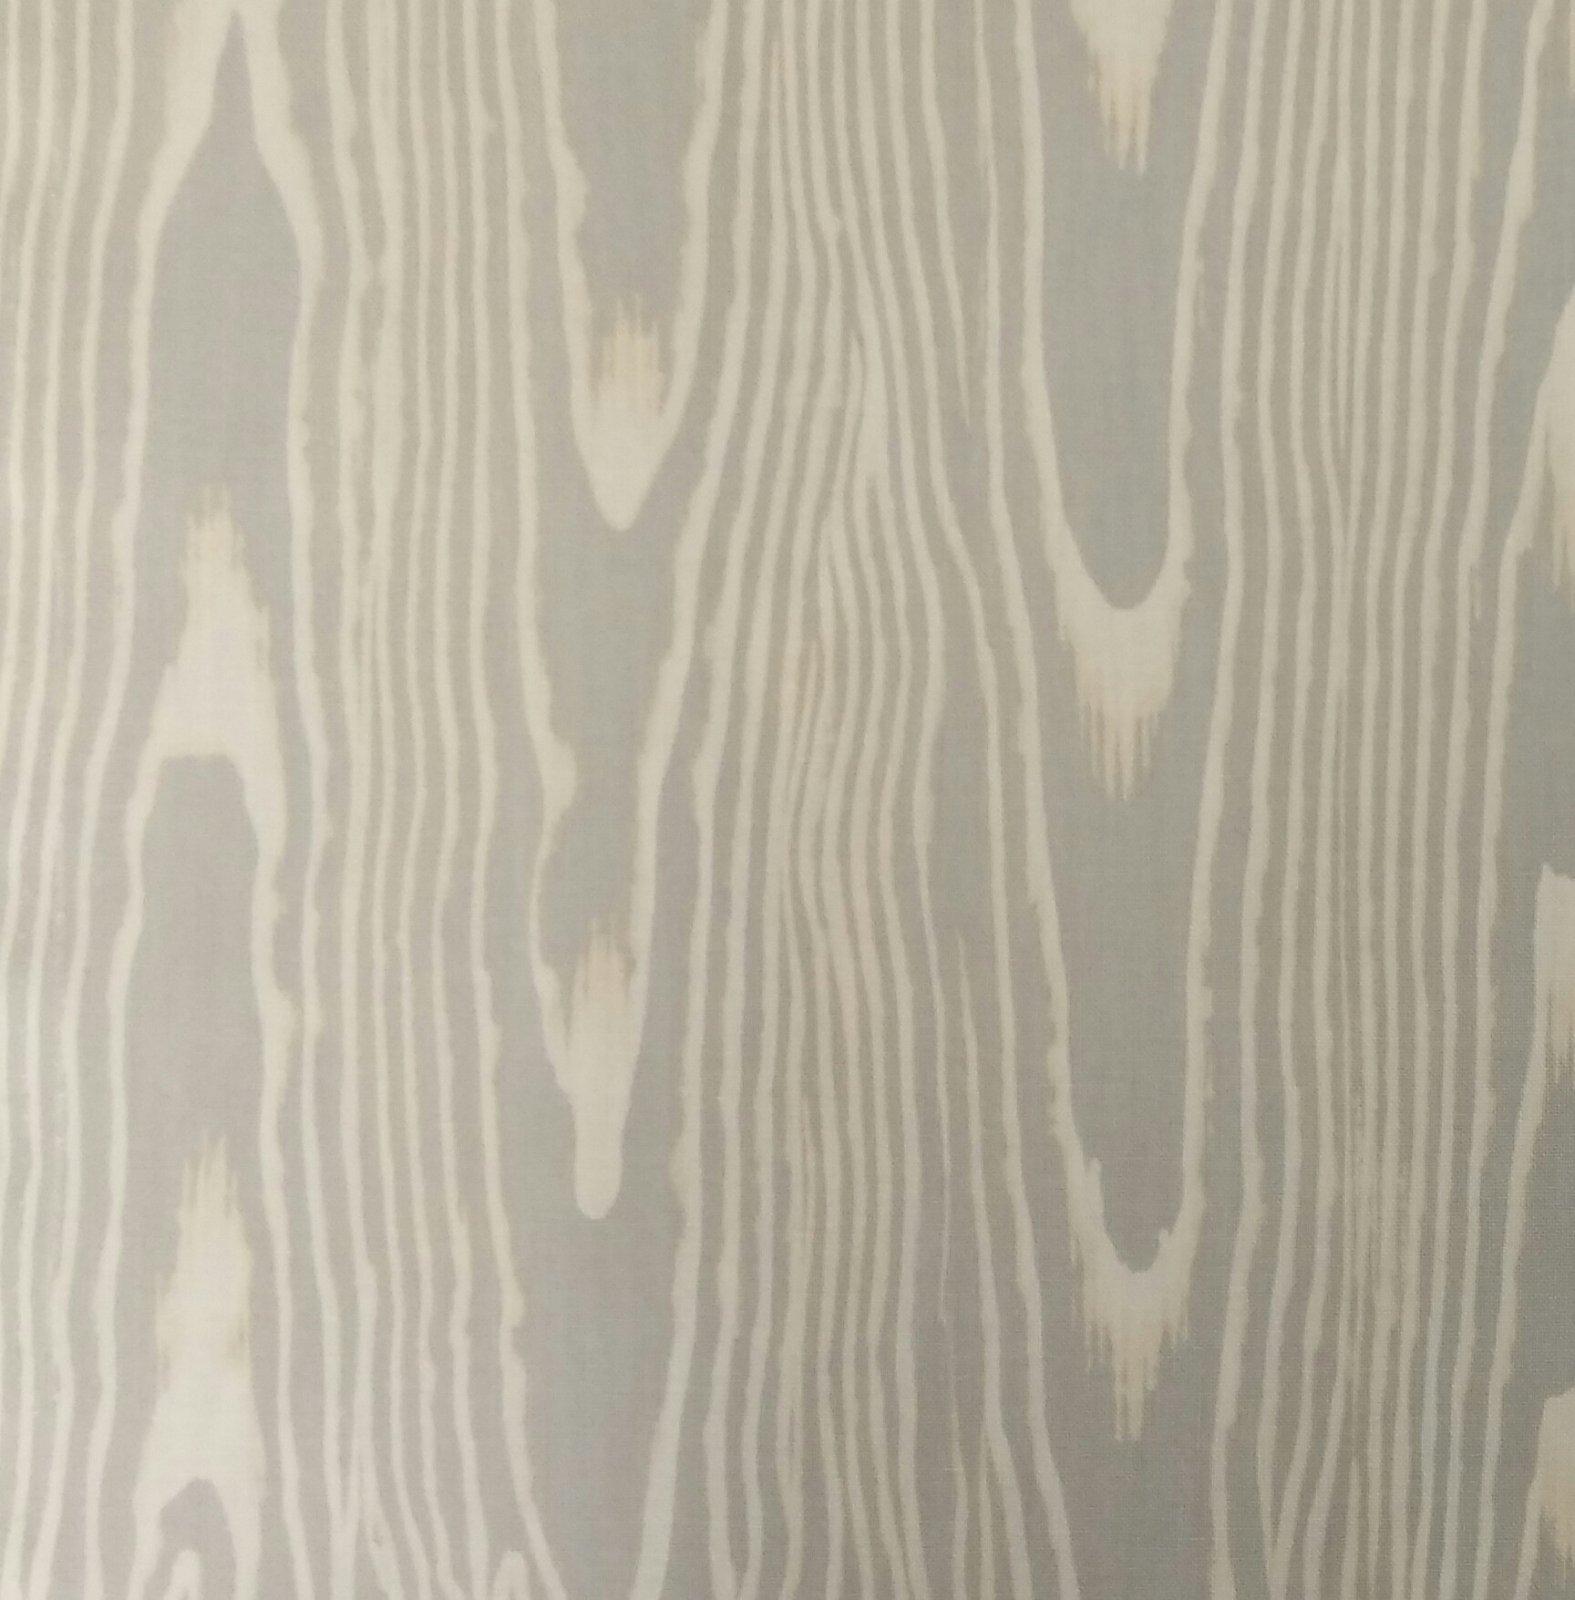 Faux Bois Moda Grey Faux Wood Grain Tree Cotton Quilt Fabric MO52